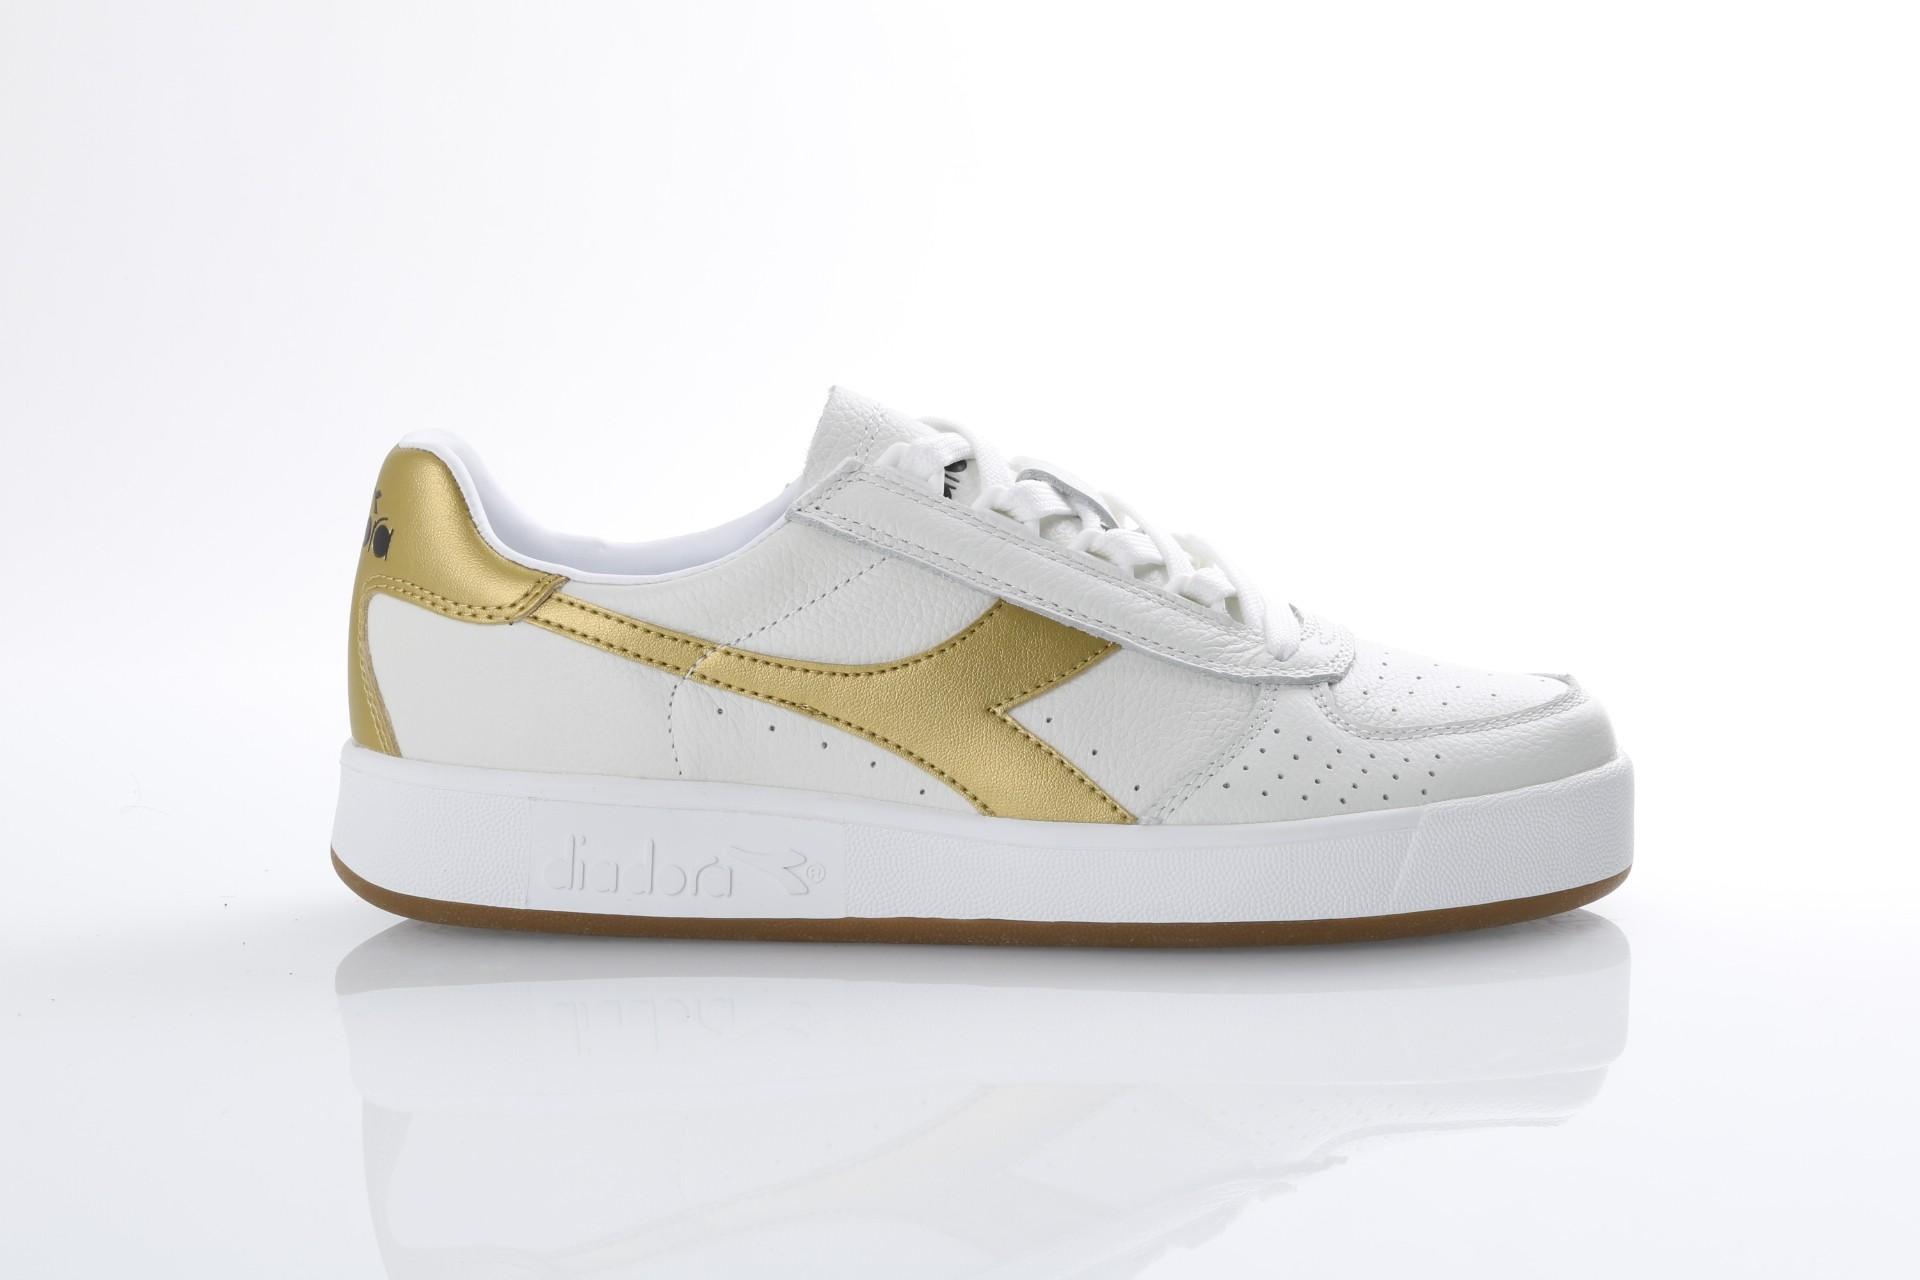 Foto van Diadora 501.173.090-C1070 Sneakers B elite 1 Wit